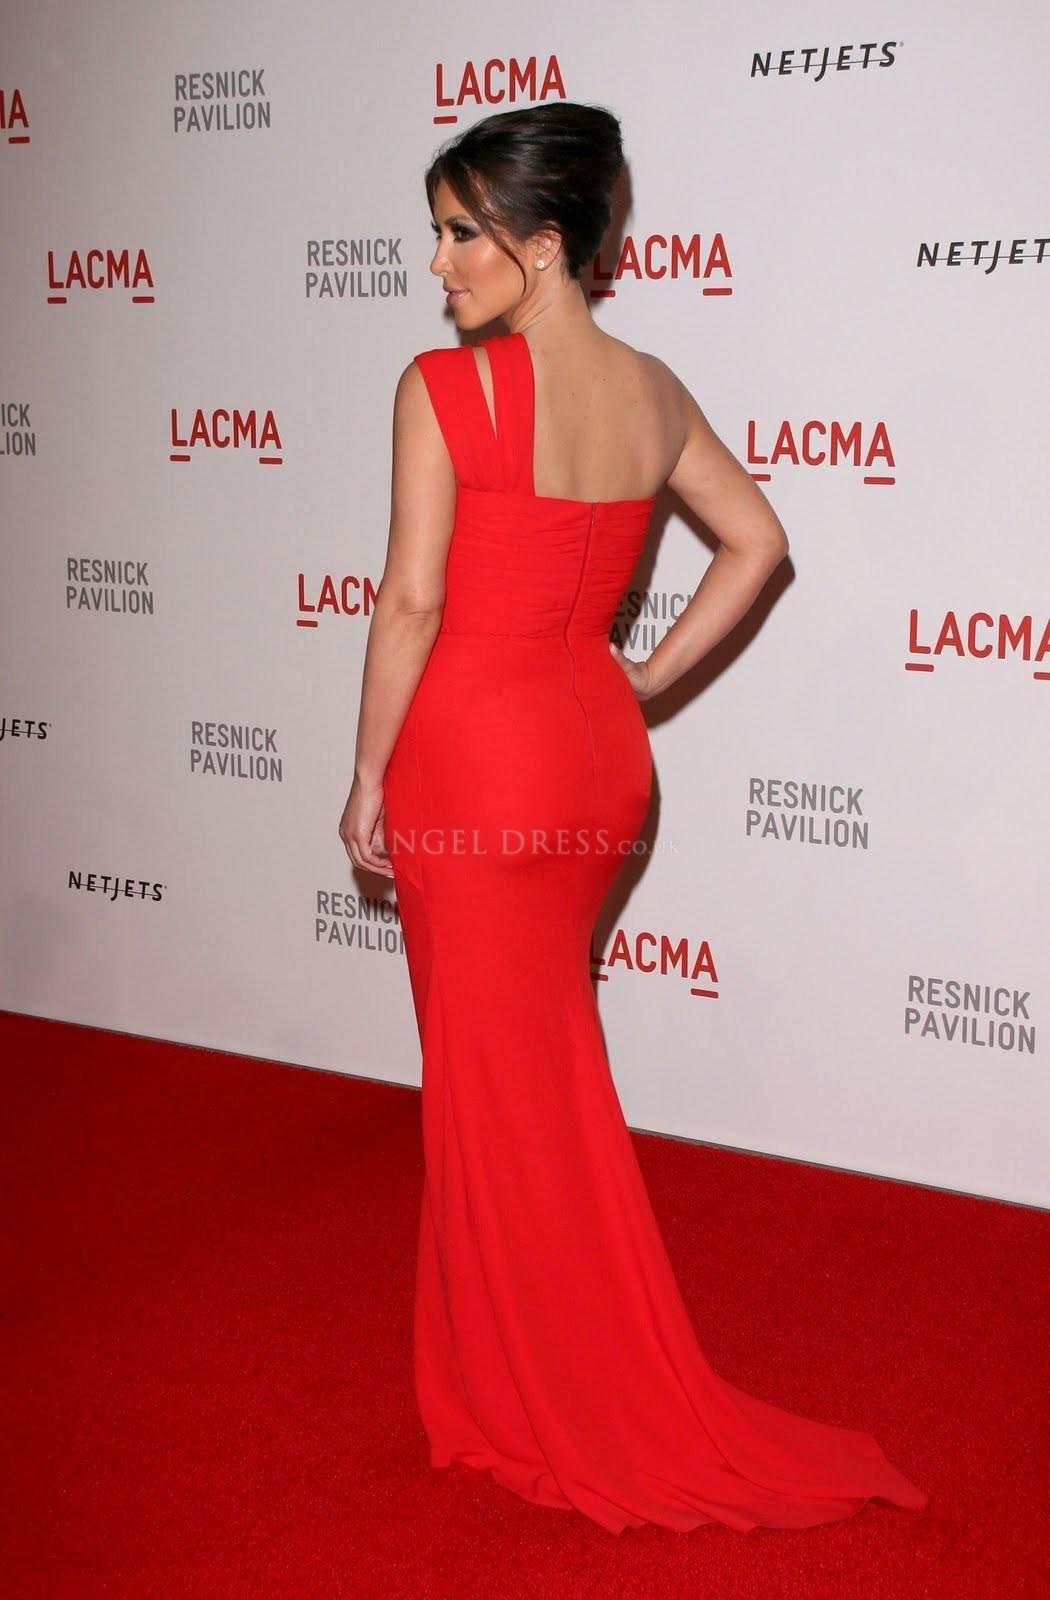 one-shoulder-chiffon-sheath-column-floor-length-kim-kardashian-at-lacma-gala-red-carpet-dresses_120326102_03.jpg